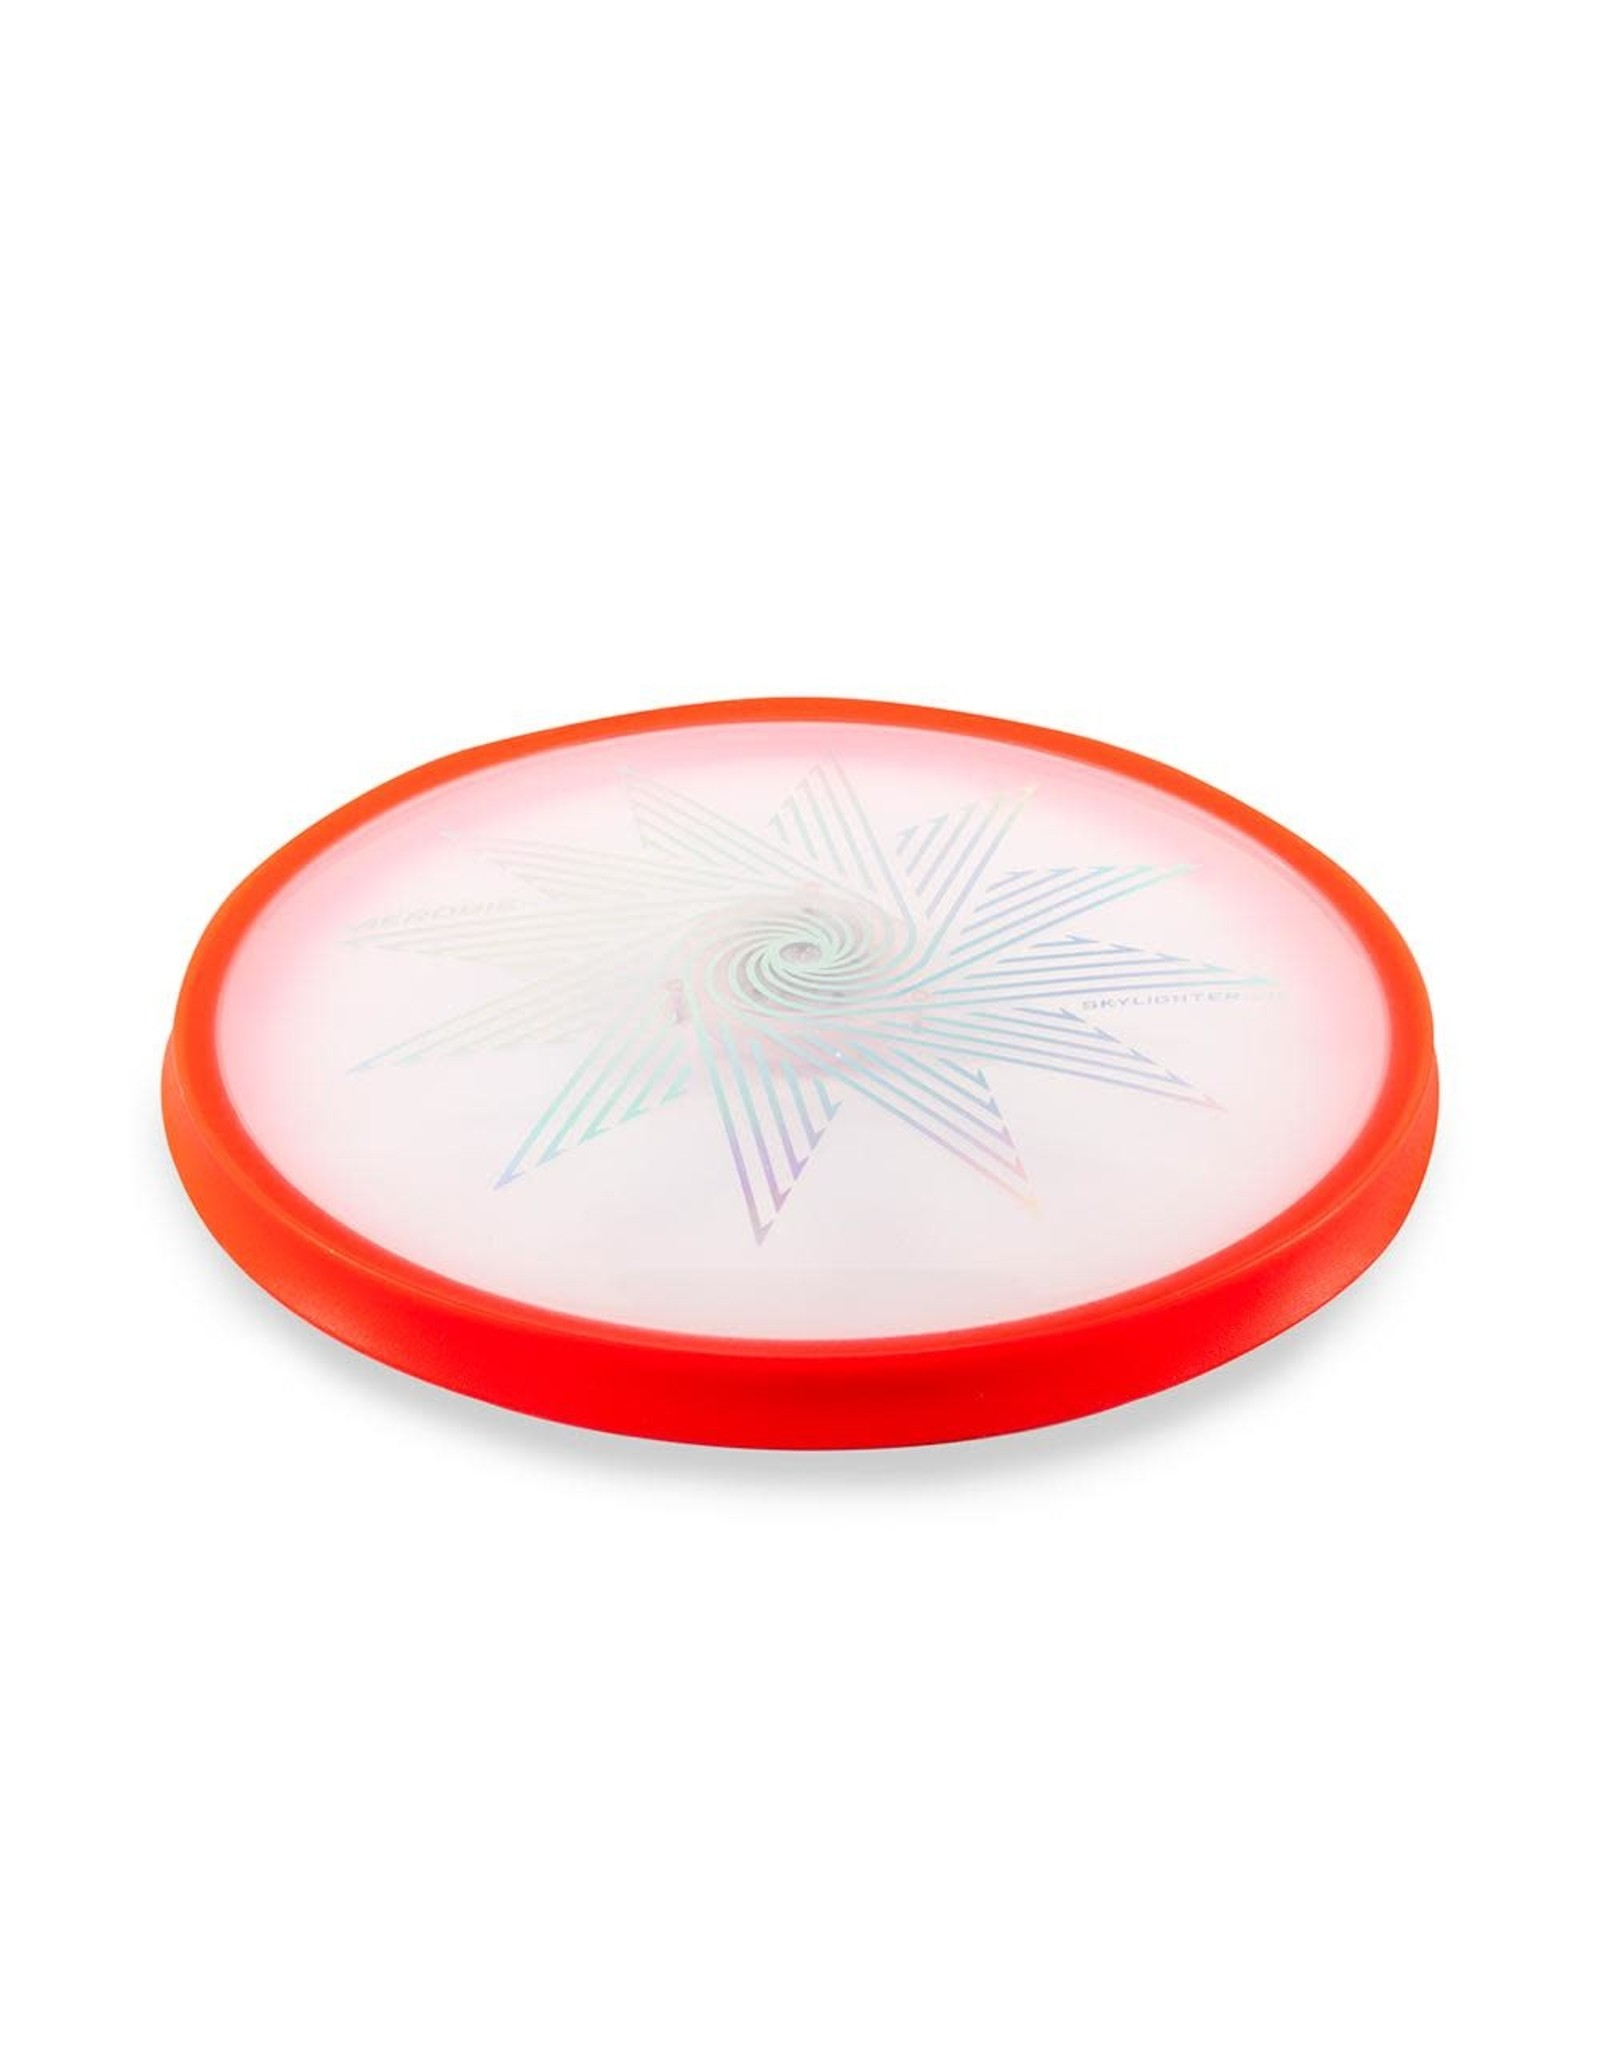 Aerobie Aerobie SkyLighter Light Up Flying Disk Red